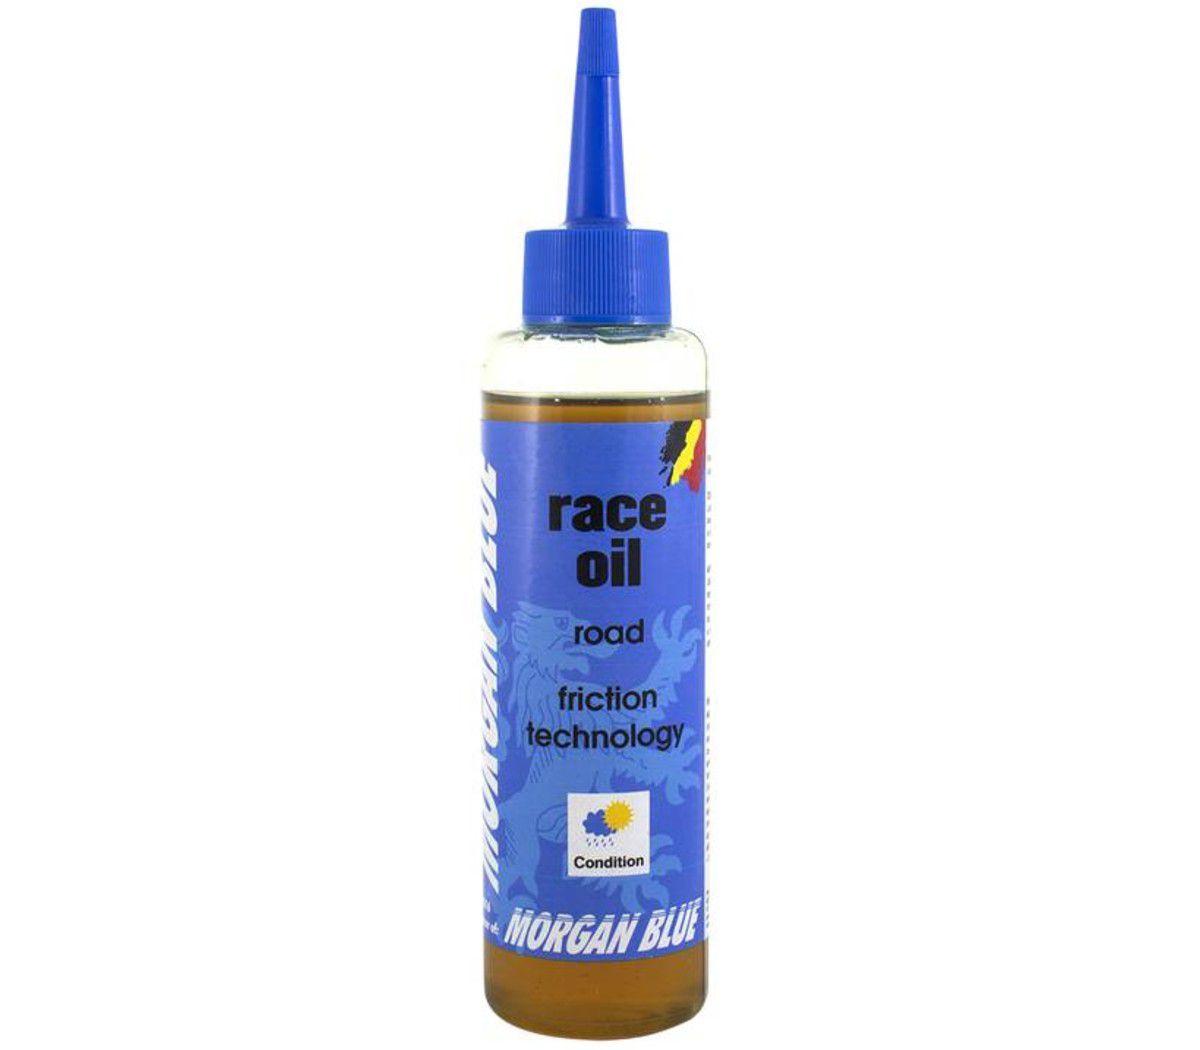 OLEO LUBRIFICANTE MORGAN BLUE RACE PARA SPEED 125 ML